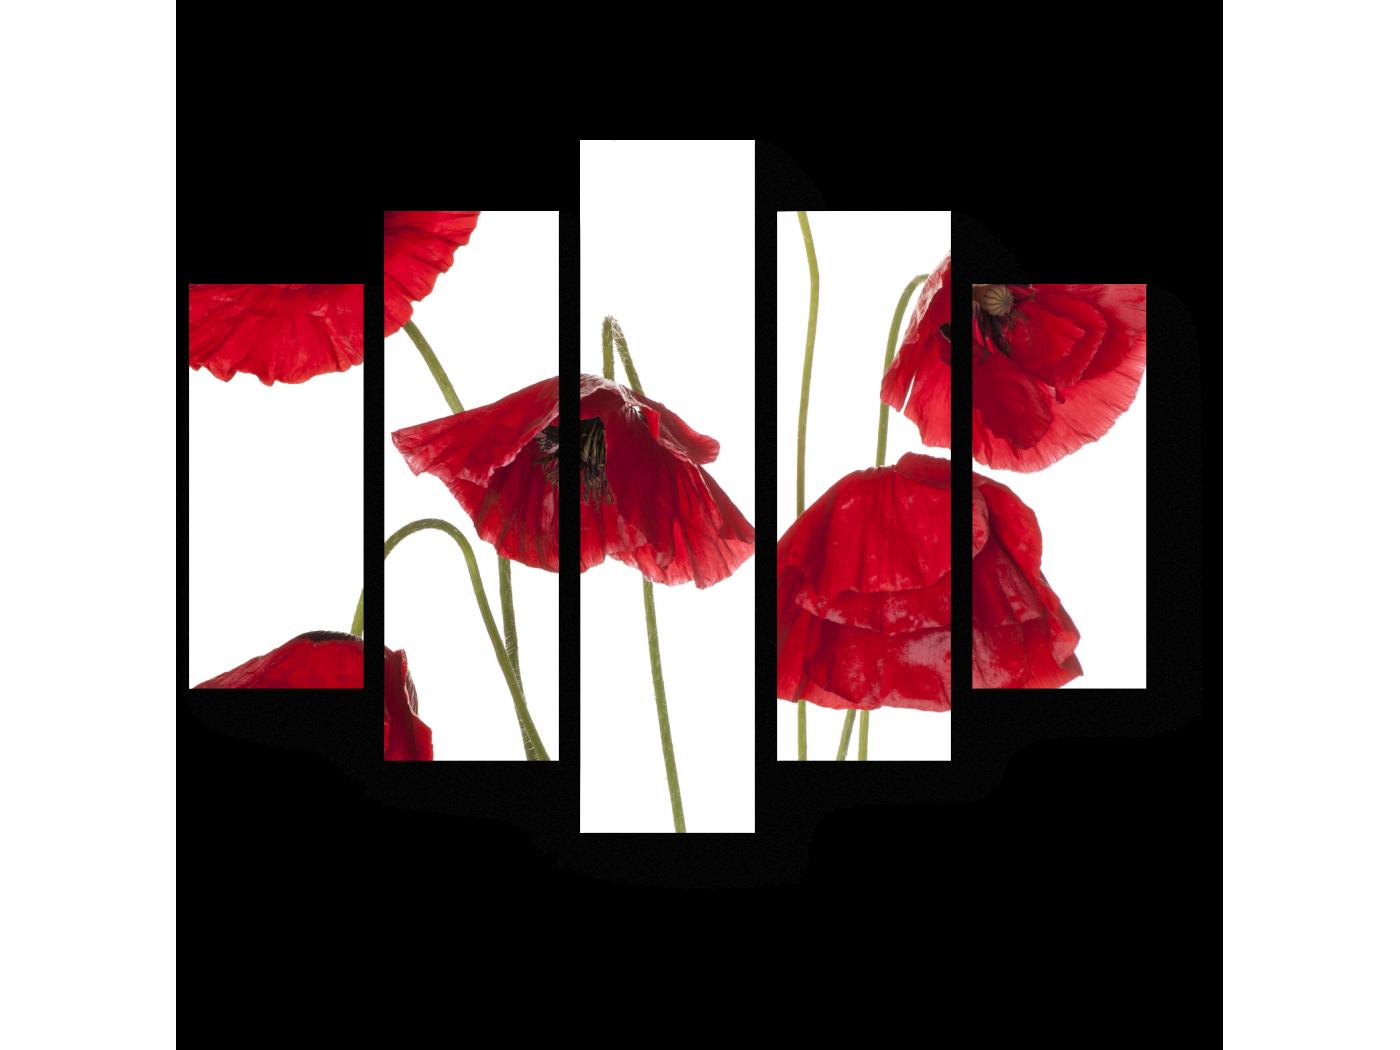 Модульная картина Маки во всей красоте (75x60) фото